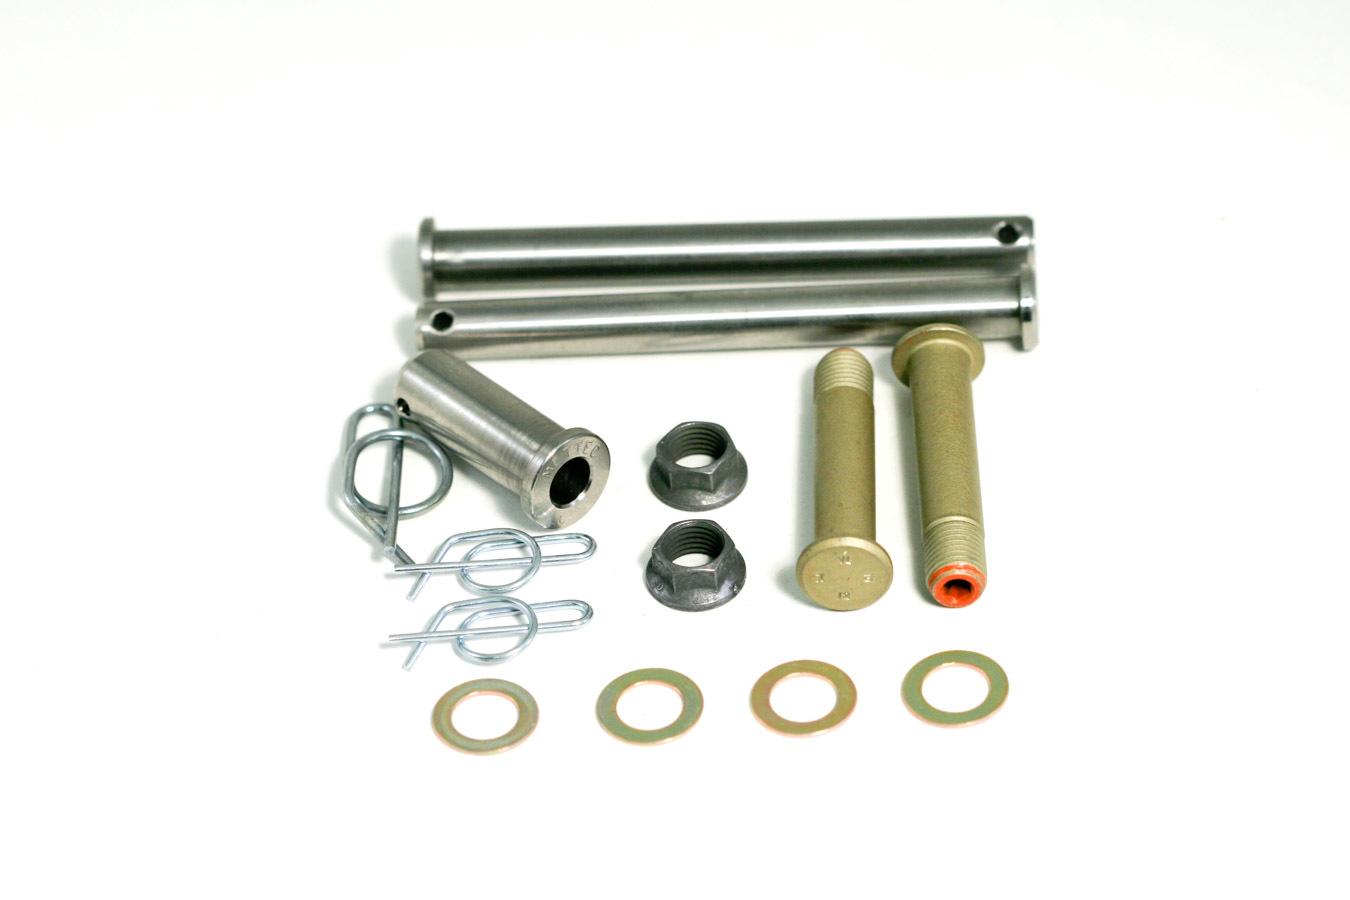 Mettec KT520 Jacobs Ladder Pin, 3/8 in Diameter, 3-3/4 in Long, Clips/Springs, Titanium, Natural, Sprint Car, Kit